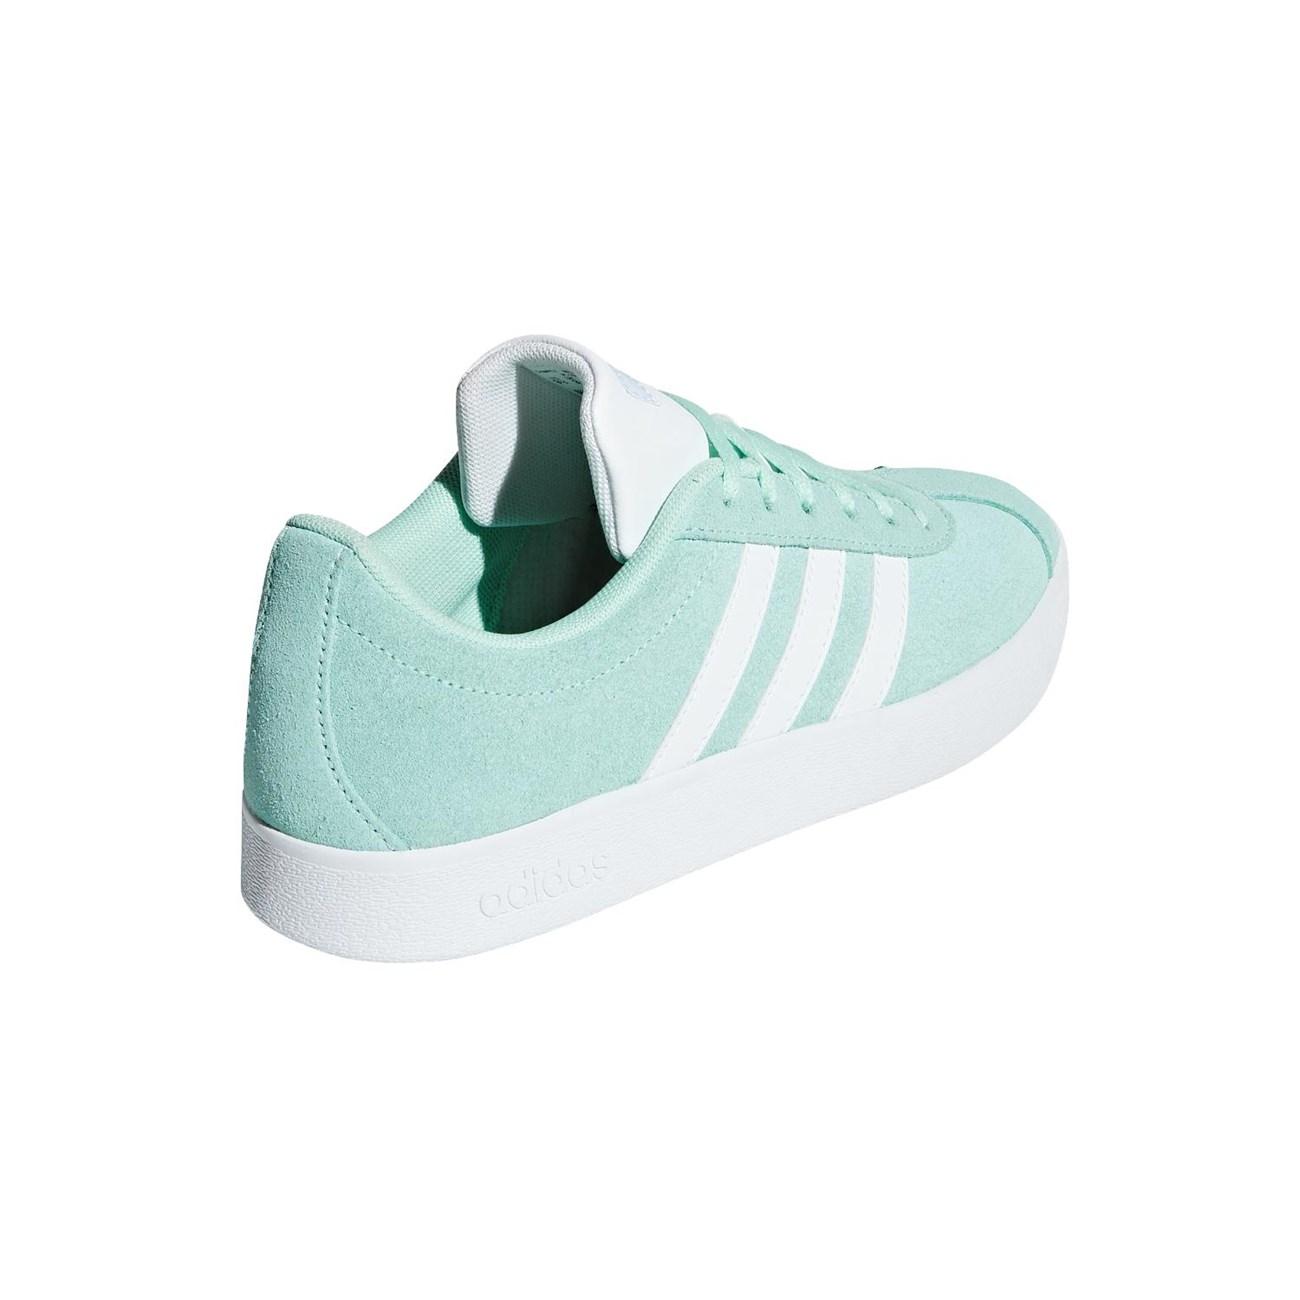 ADIDAS VL COURT 2.0 JR   Sportstyle Παπούτσια  58df799c1dd